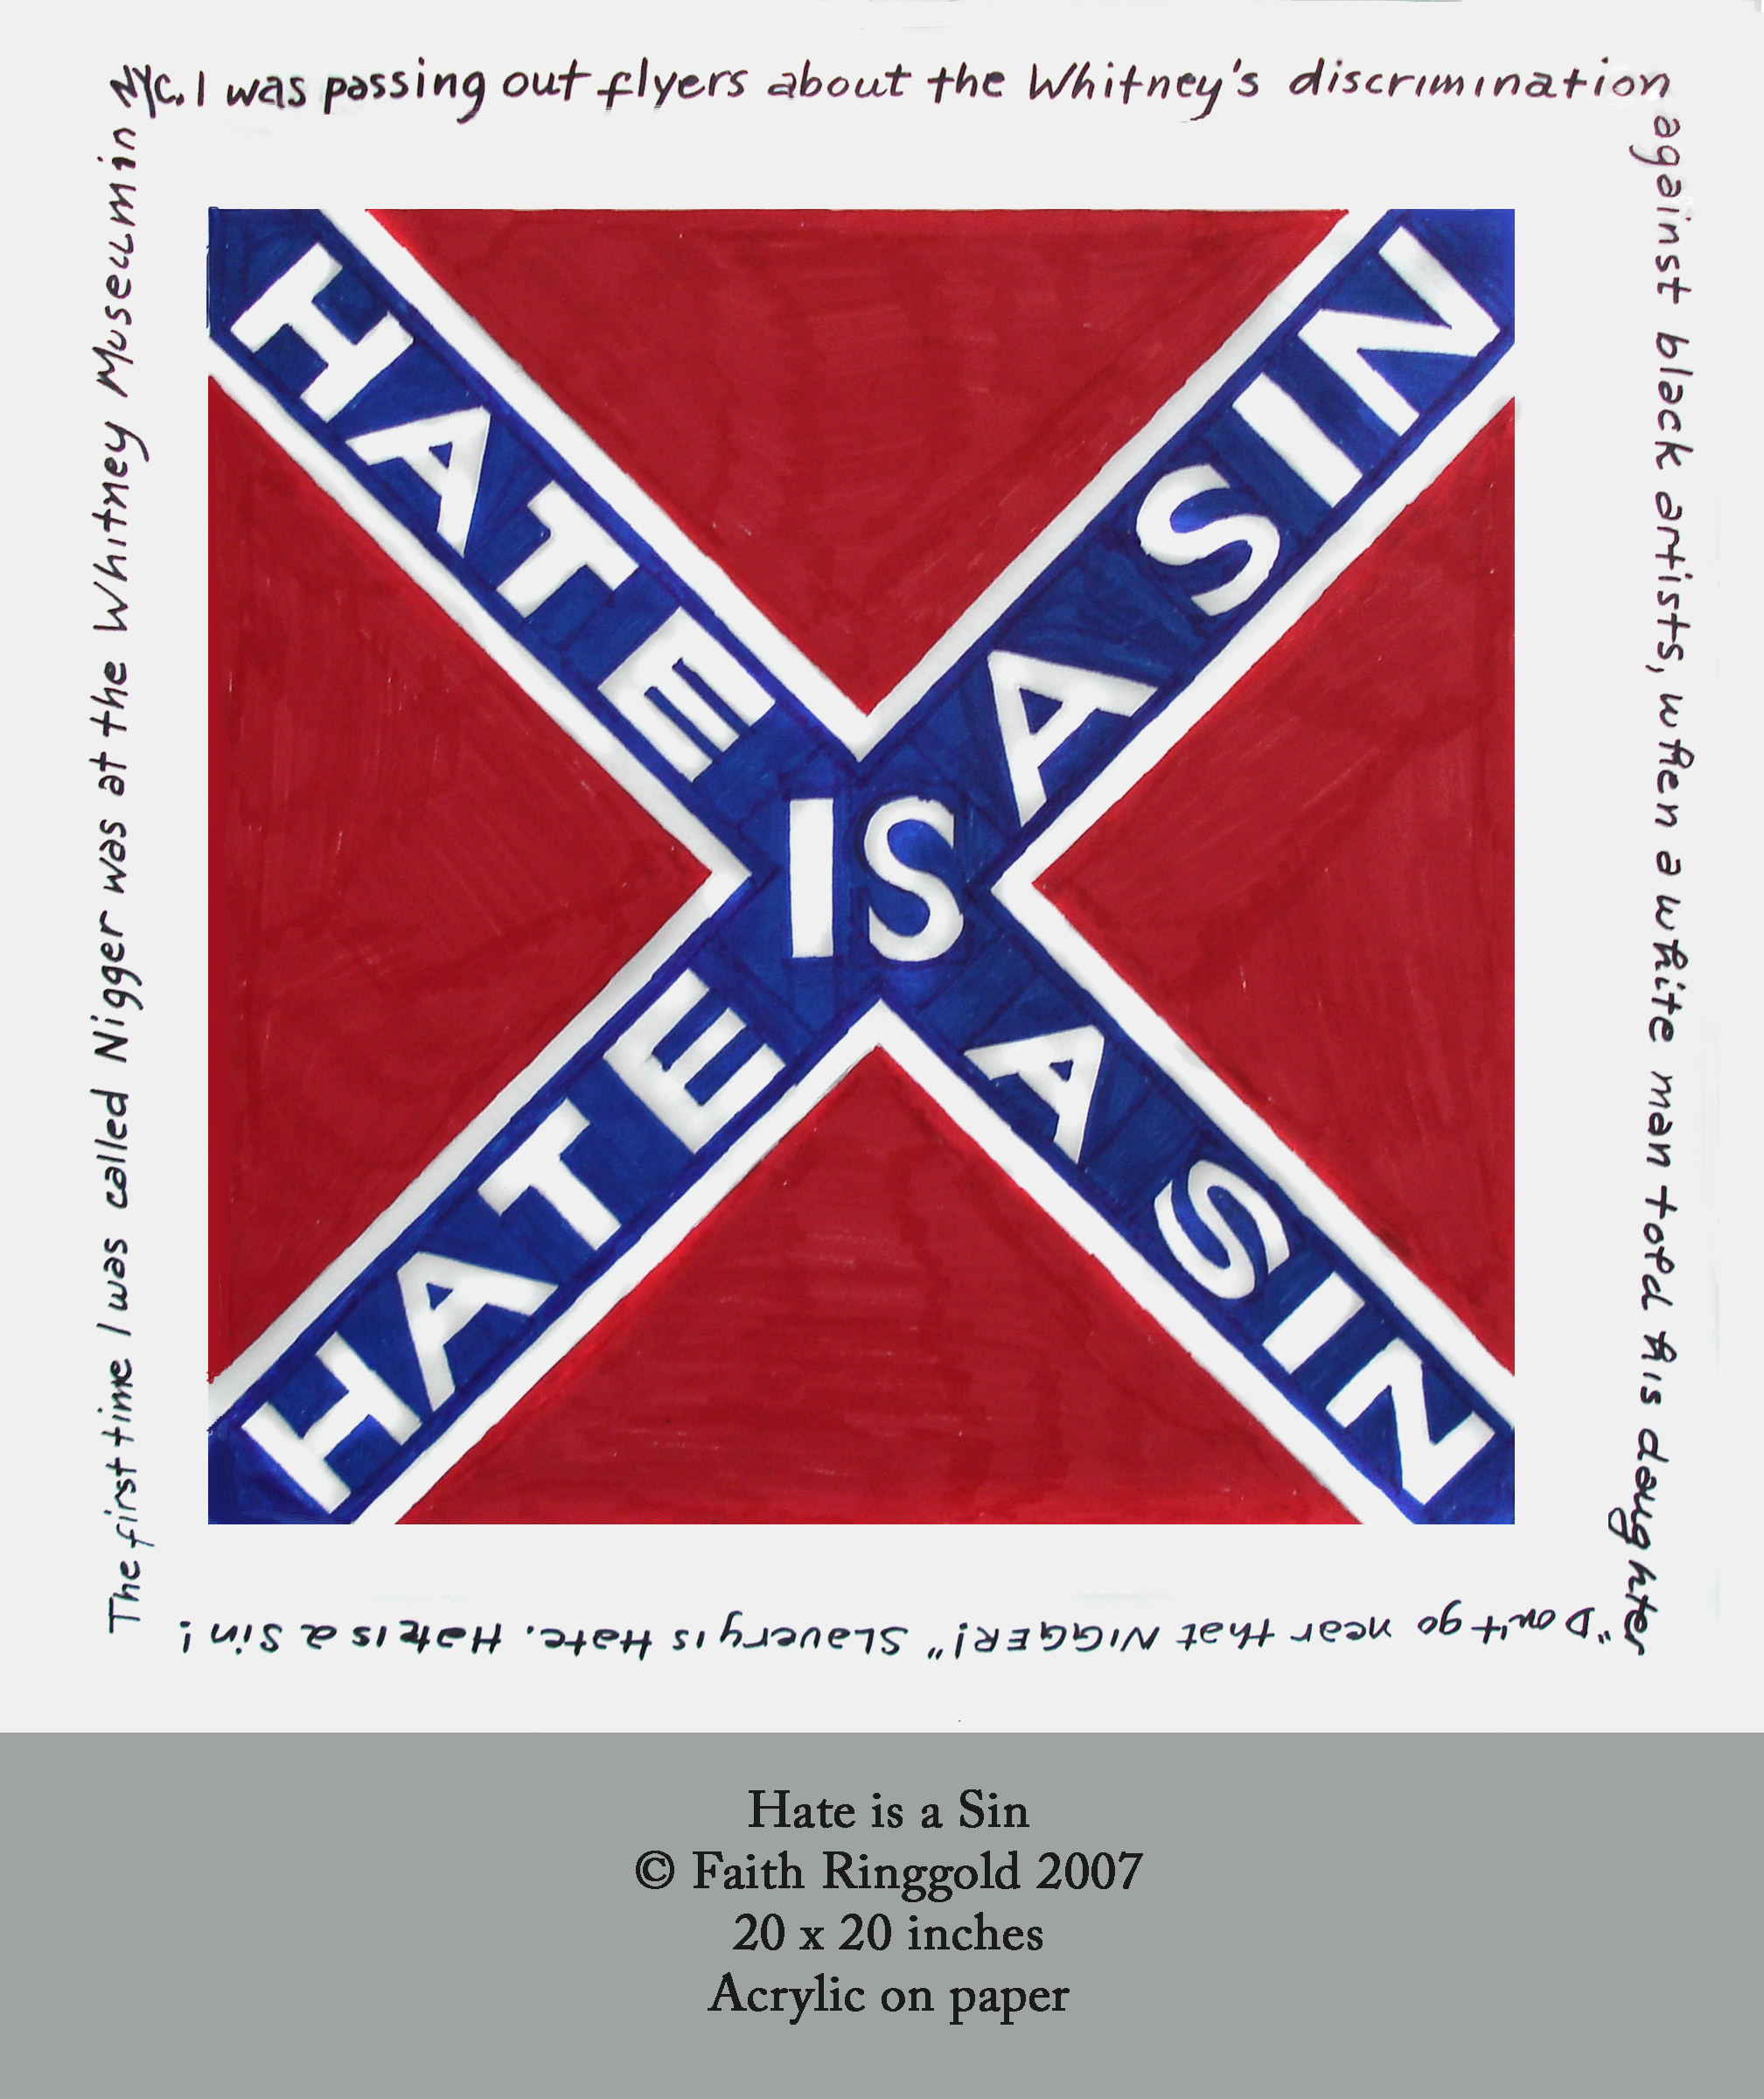 Hate Is a Sin Flag by Faith Ringgold